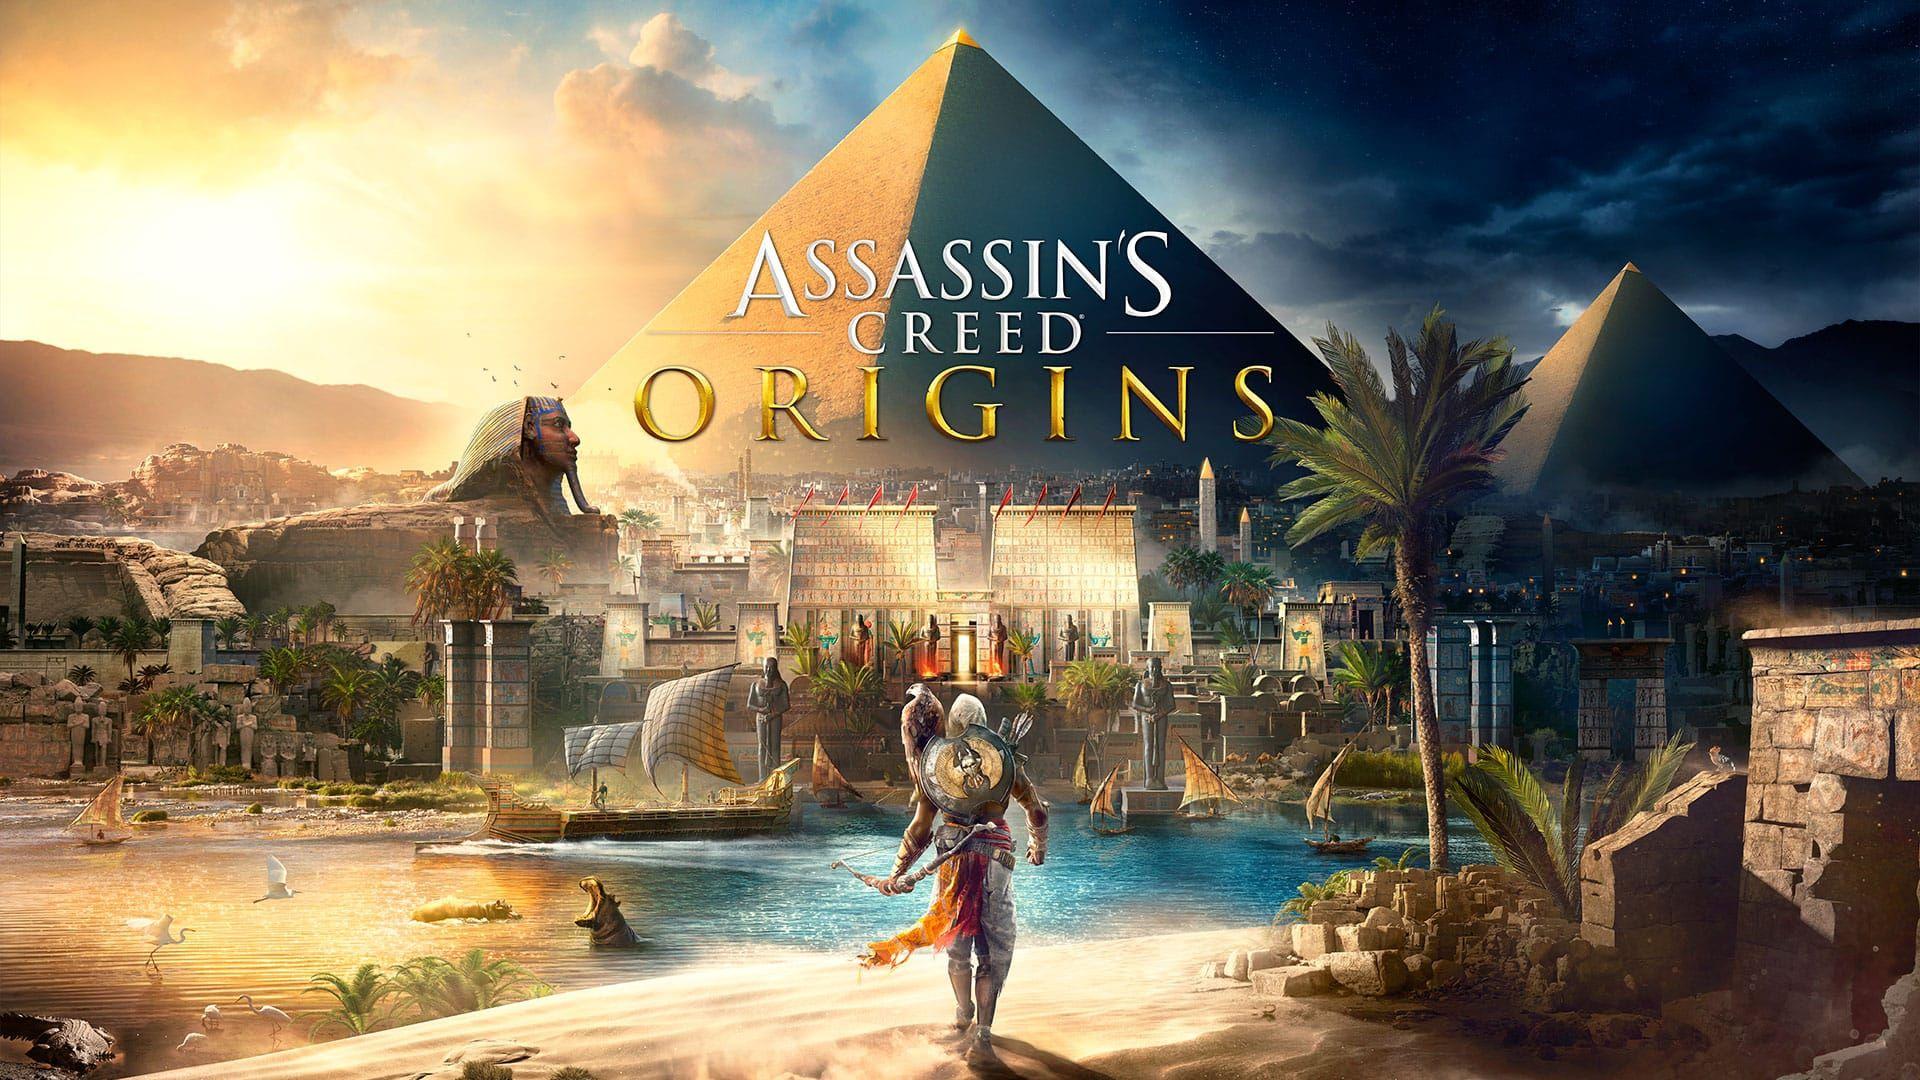 Assassin S Creed Origins Black Friday Cyber Monday Deals 2020 Assassins Creed Origins Assassin S Creed Assassins Creed